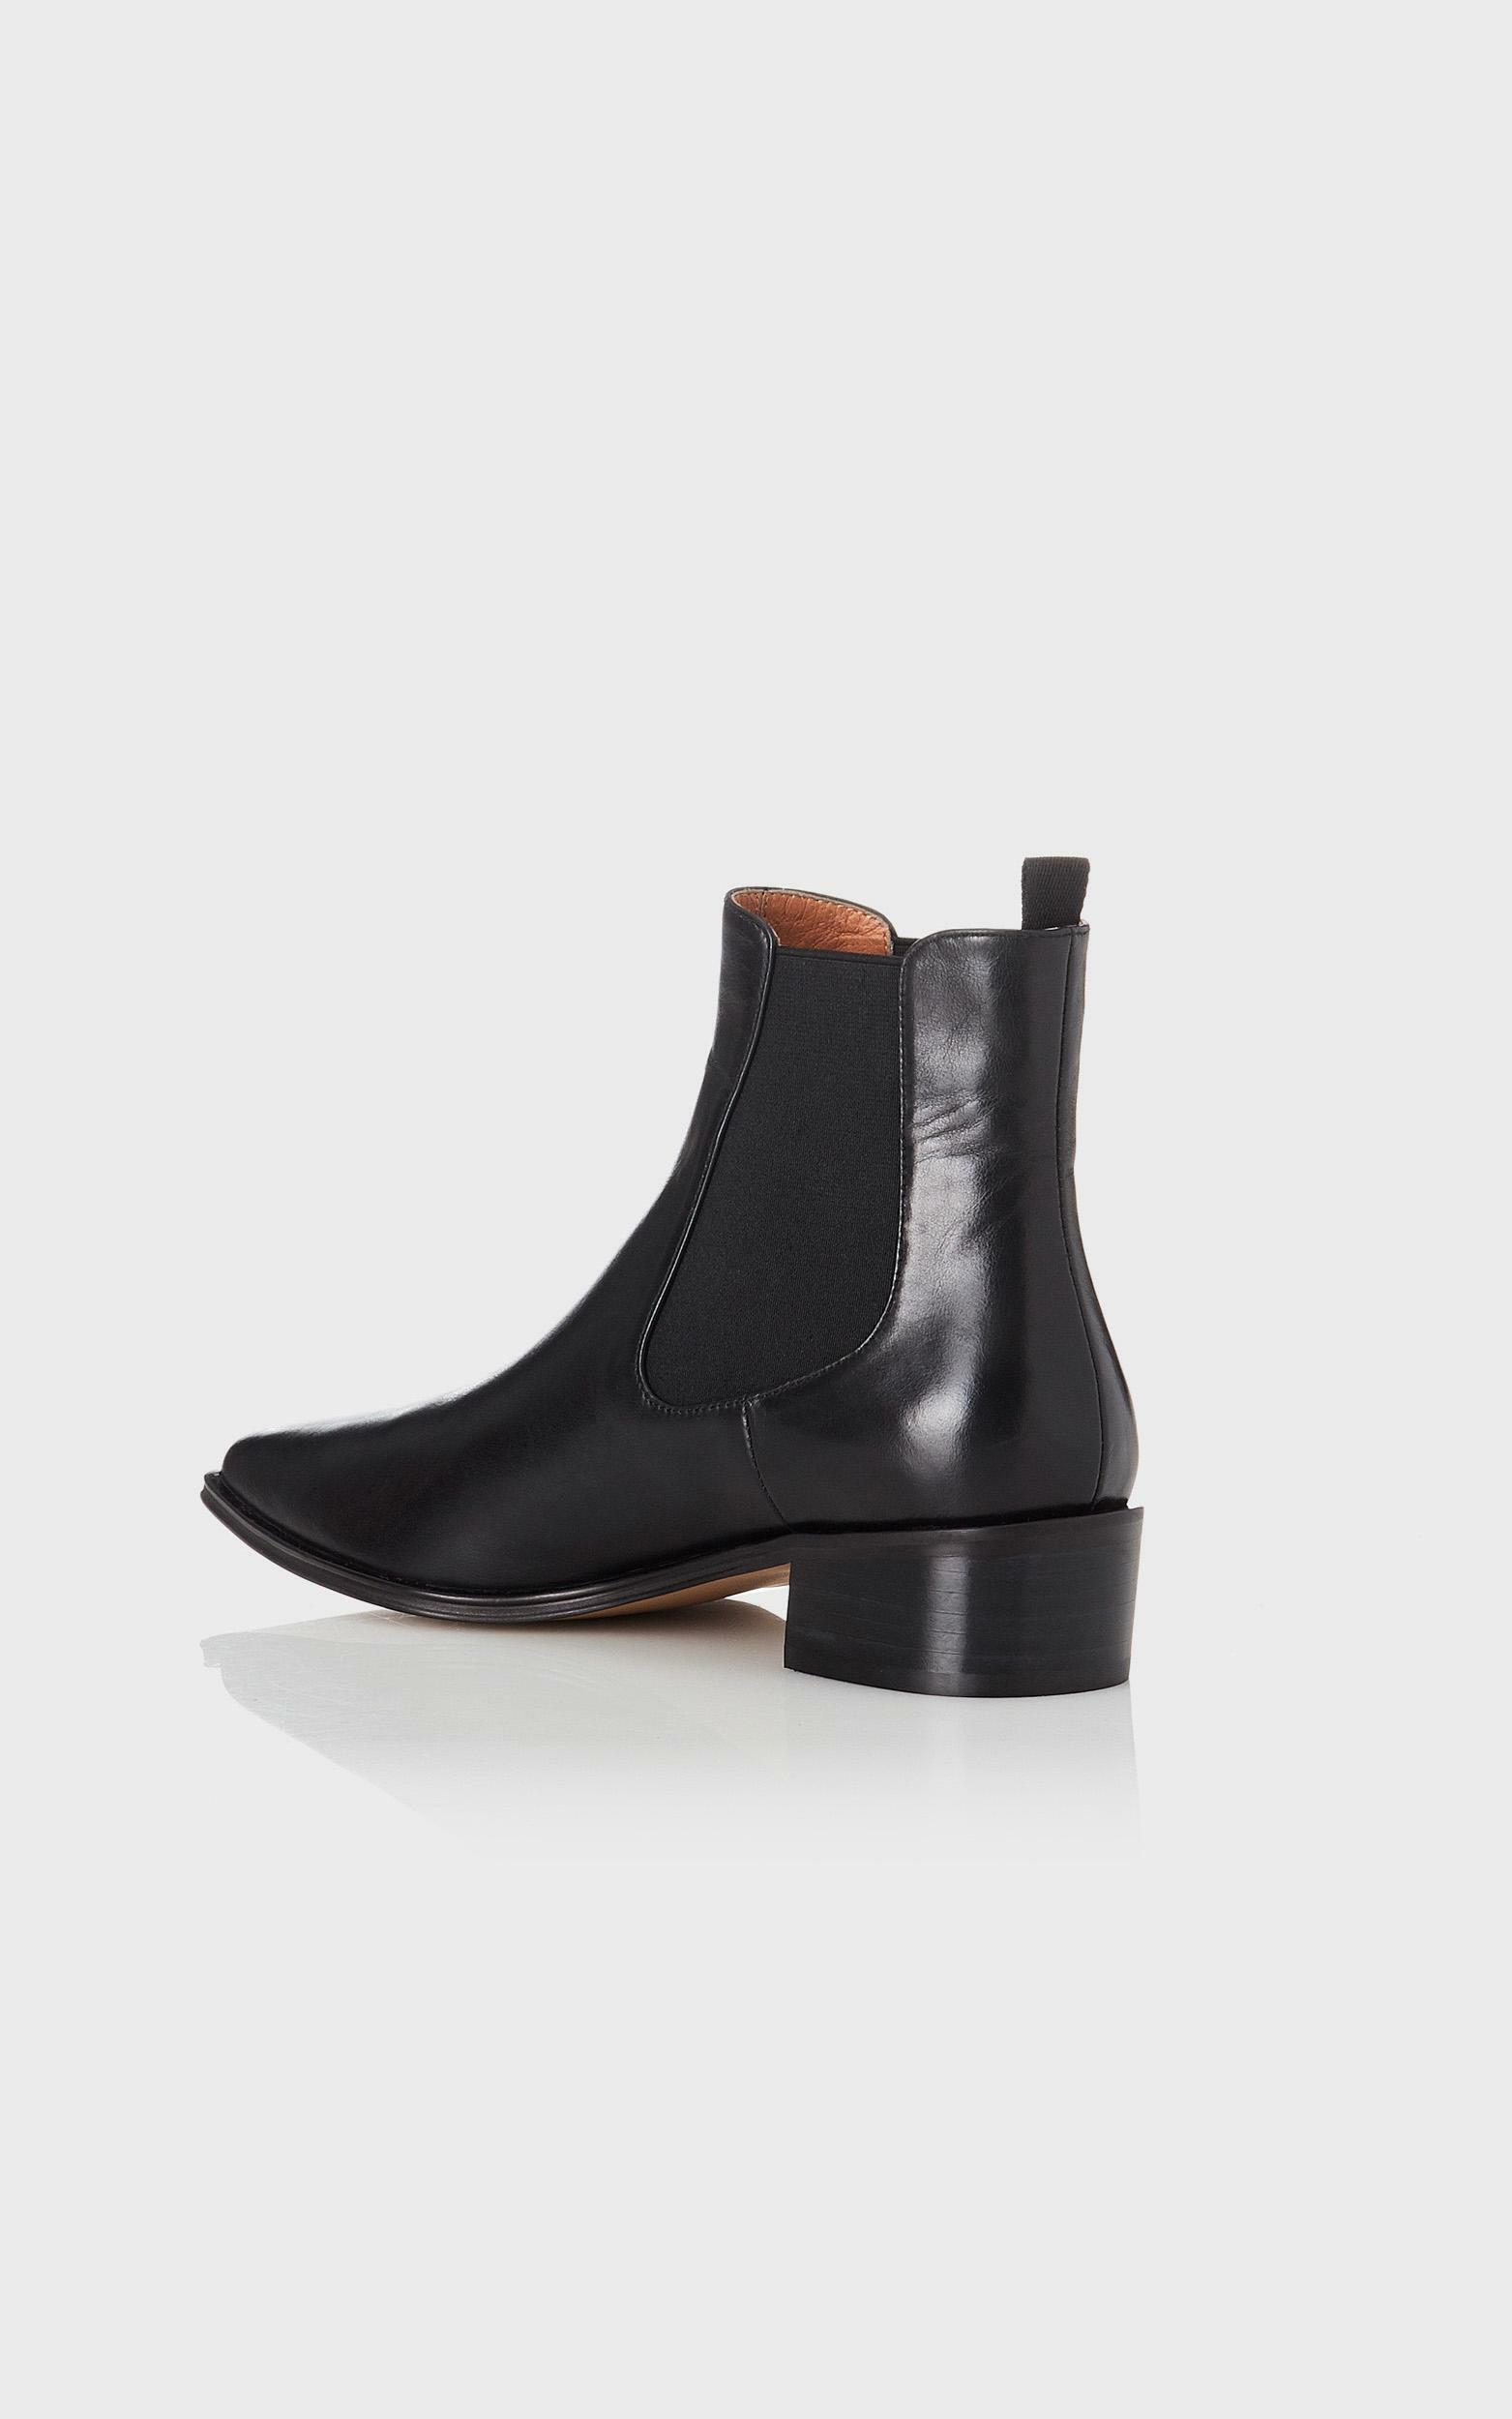 Alias Mae - Yasmyn Boots in Black Burnished - 36, Black, hi-res image number null